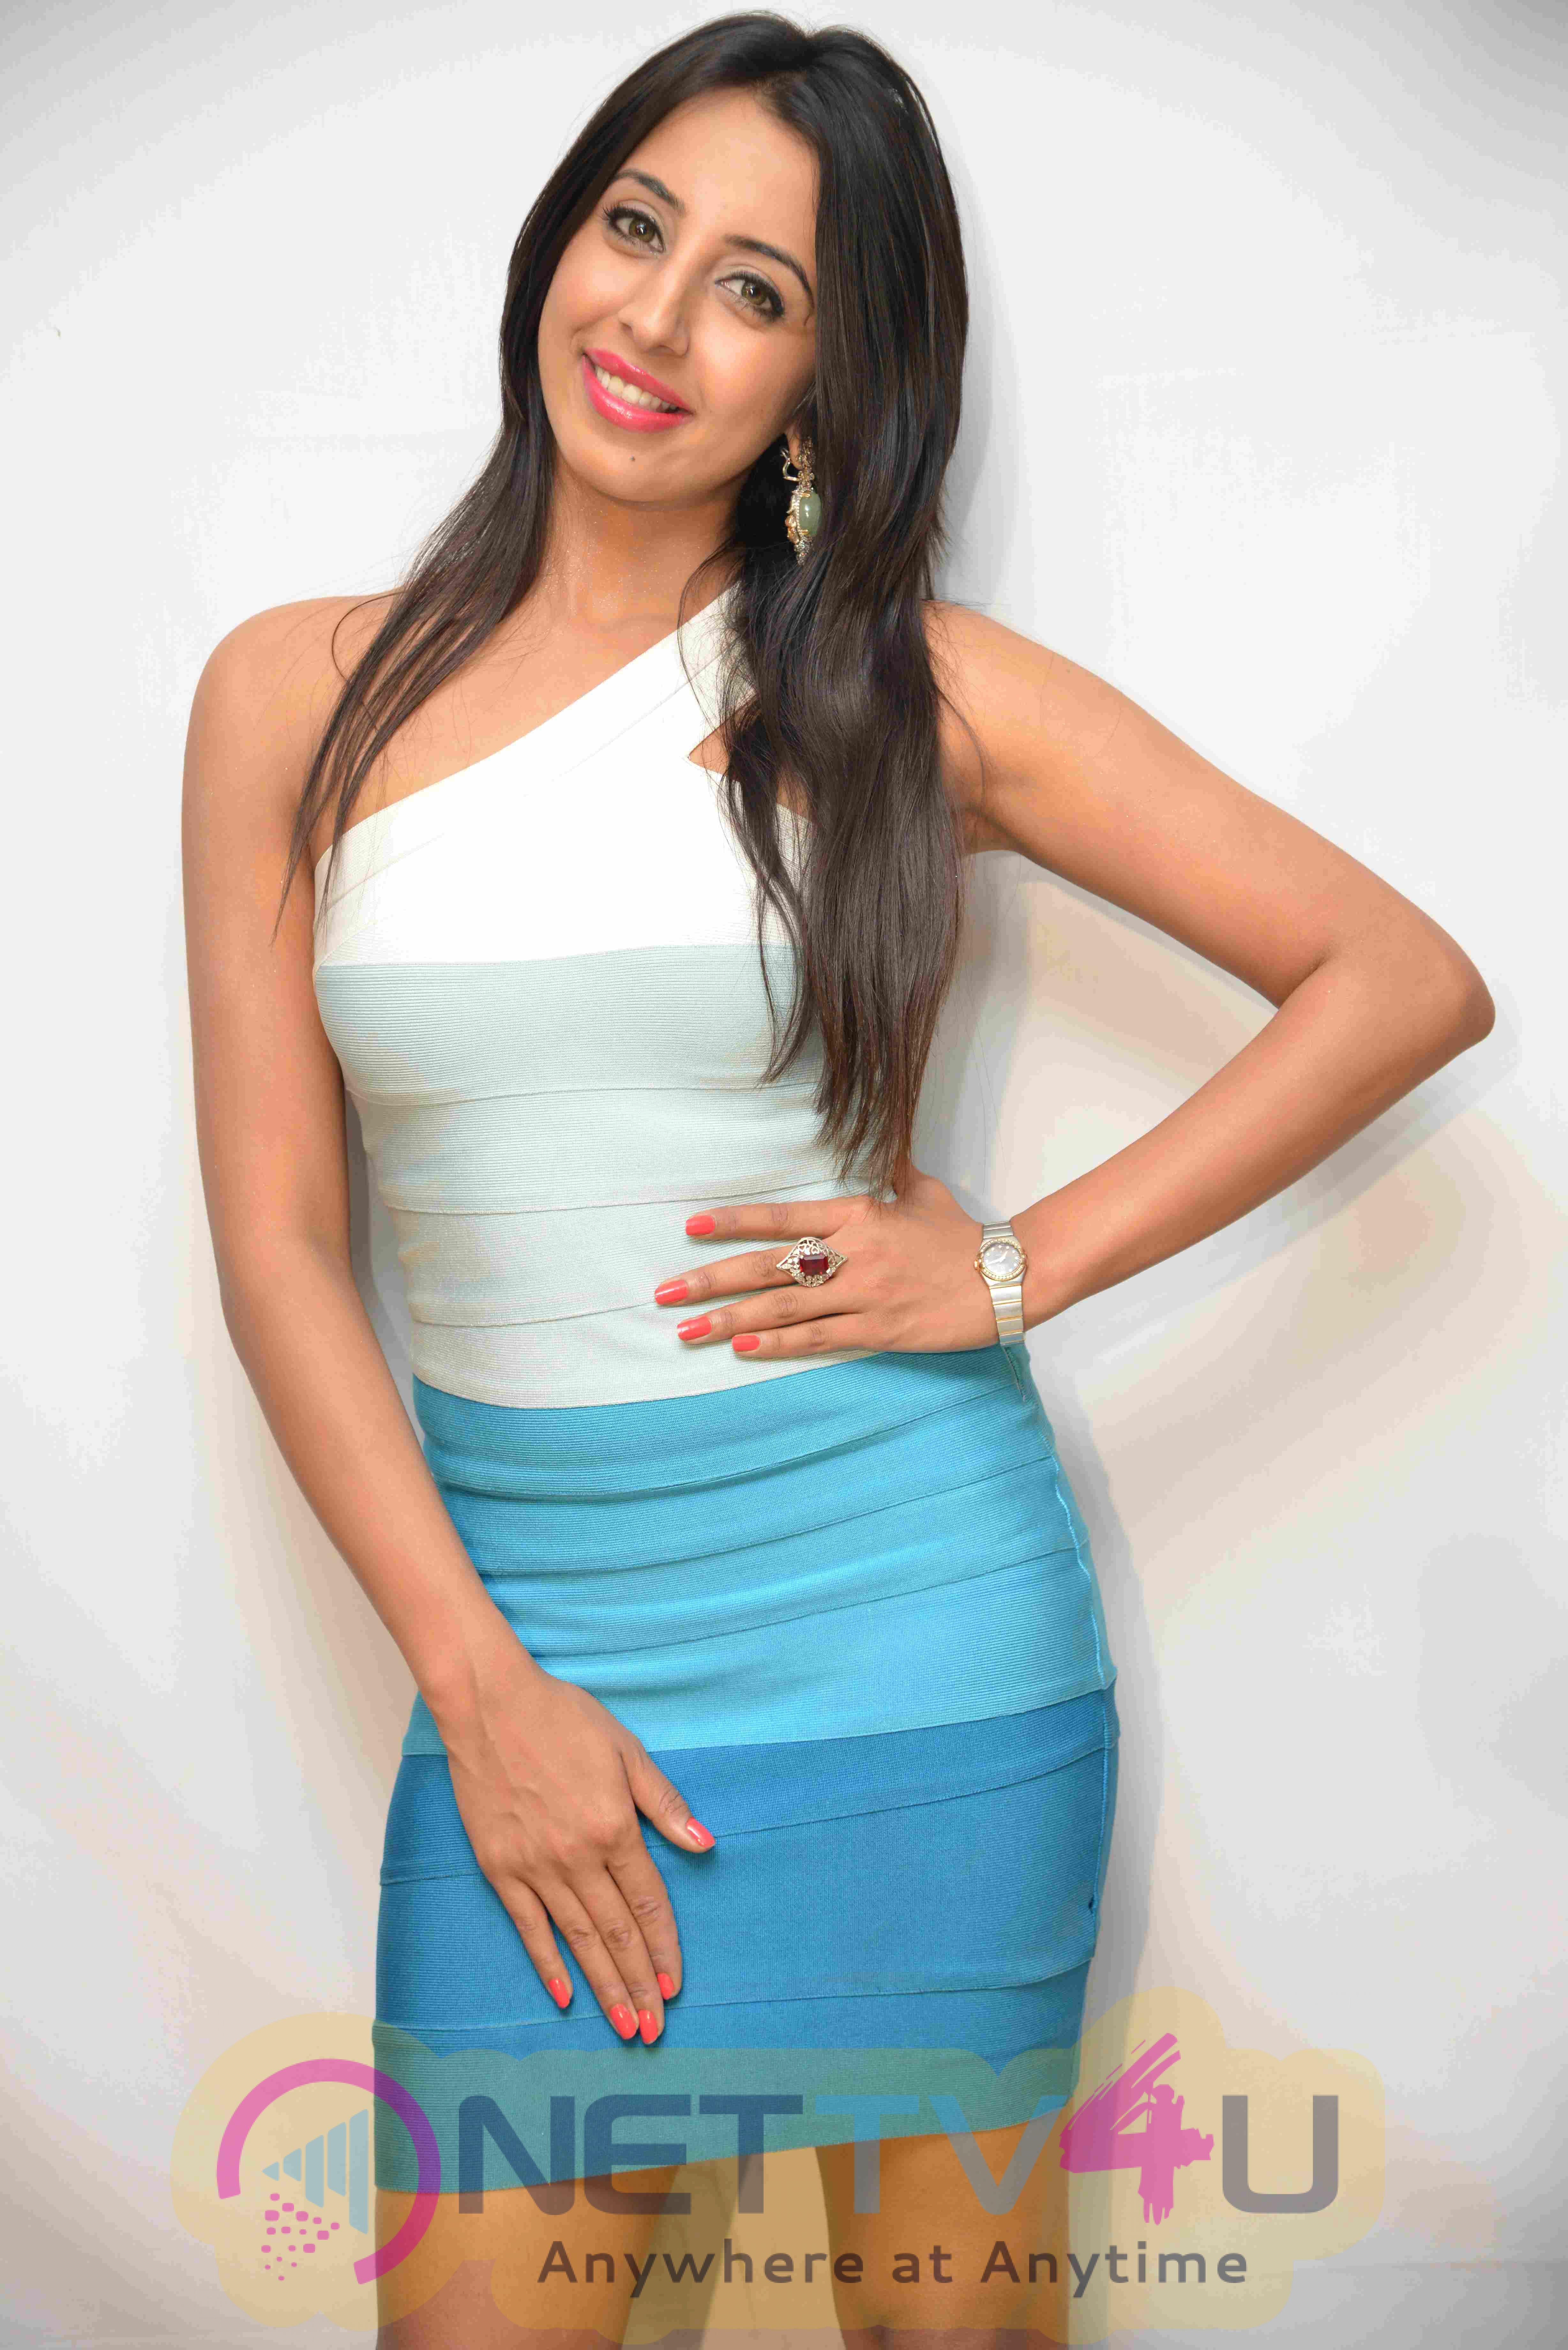 Kannada Movie Cinema My Darling Press Meet Stills